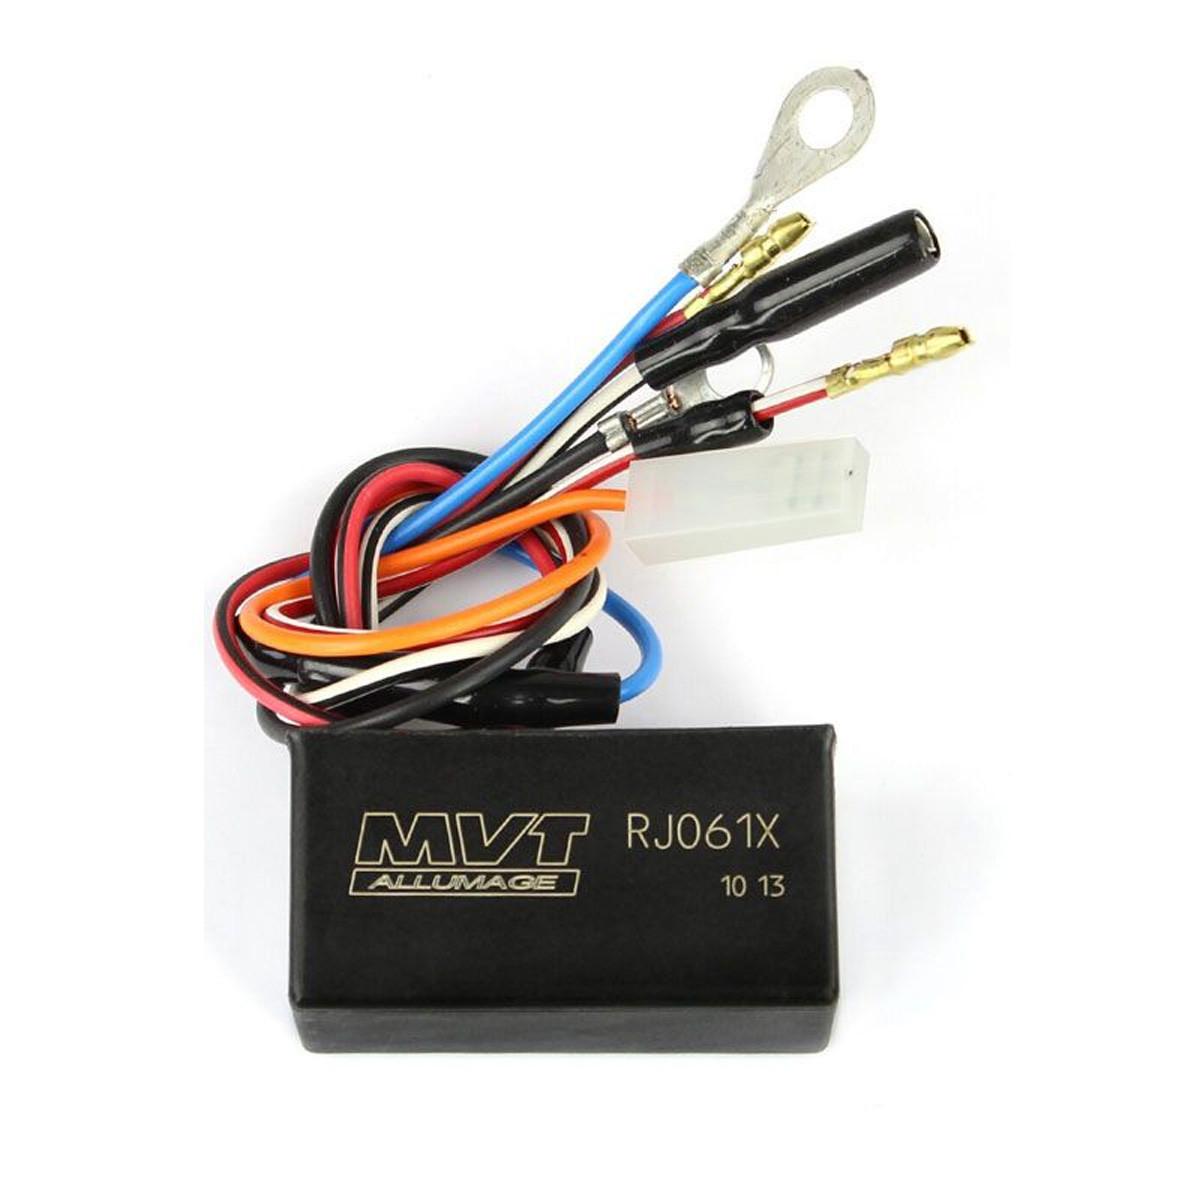 Diagramme Allumage Booster avant 2003 - MVT Millénium EXT106 EXT107